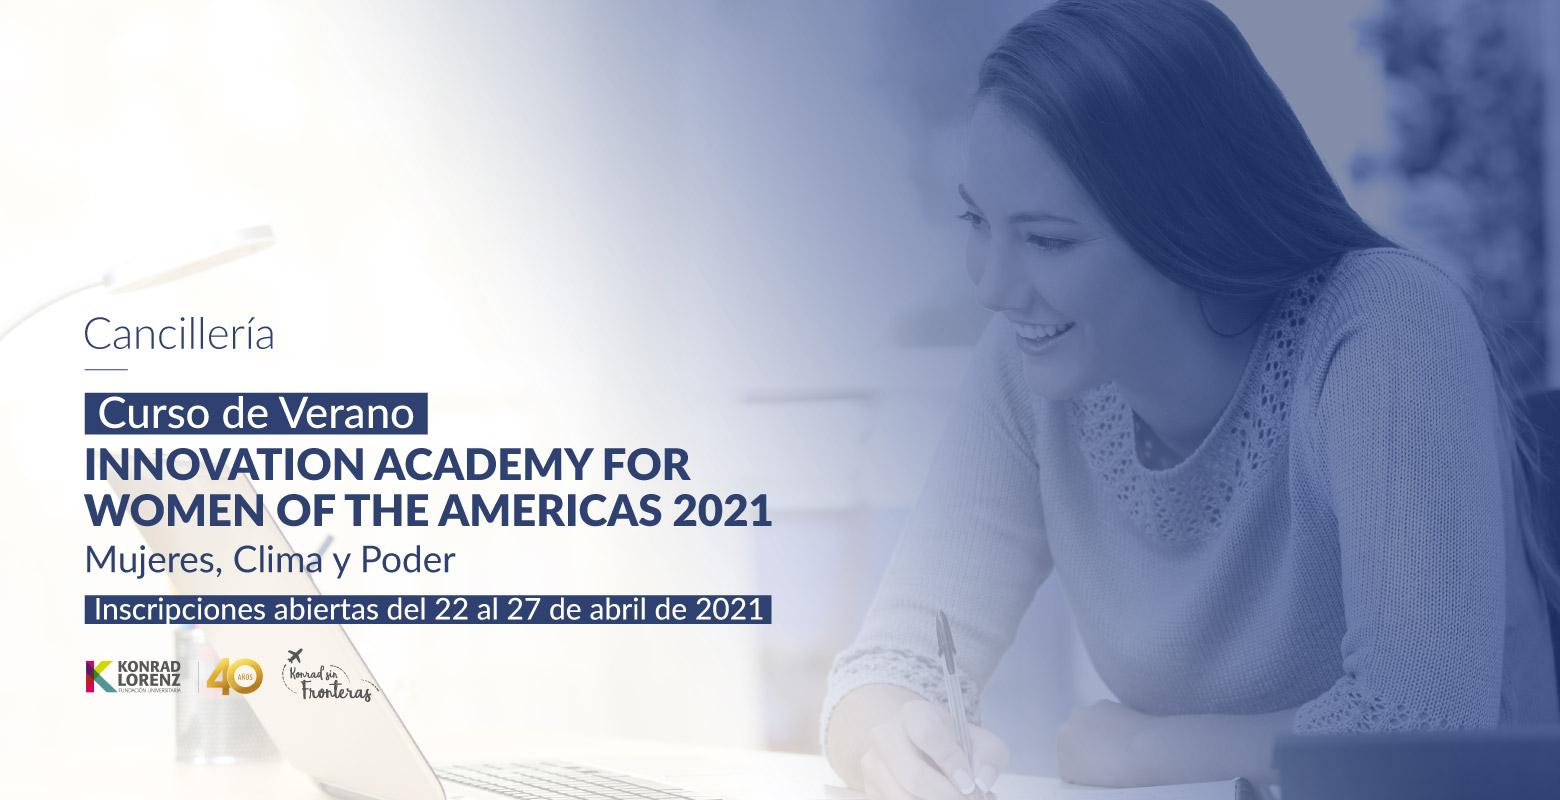 Curso de Verano: Innovation Academy for Women of The Americas 2021 - Mujeres, Clima y Poder